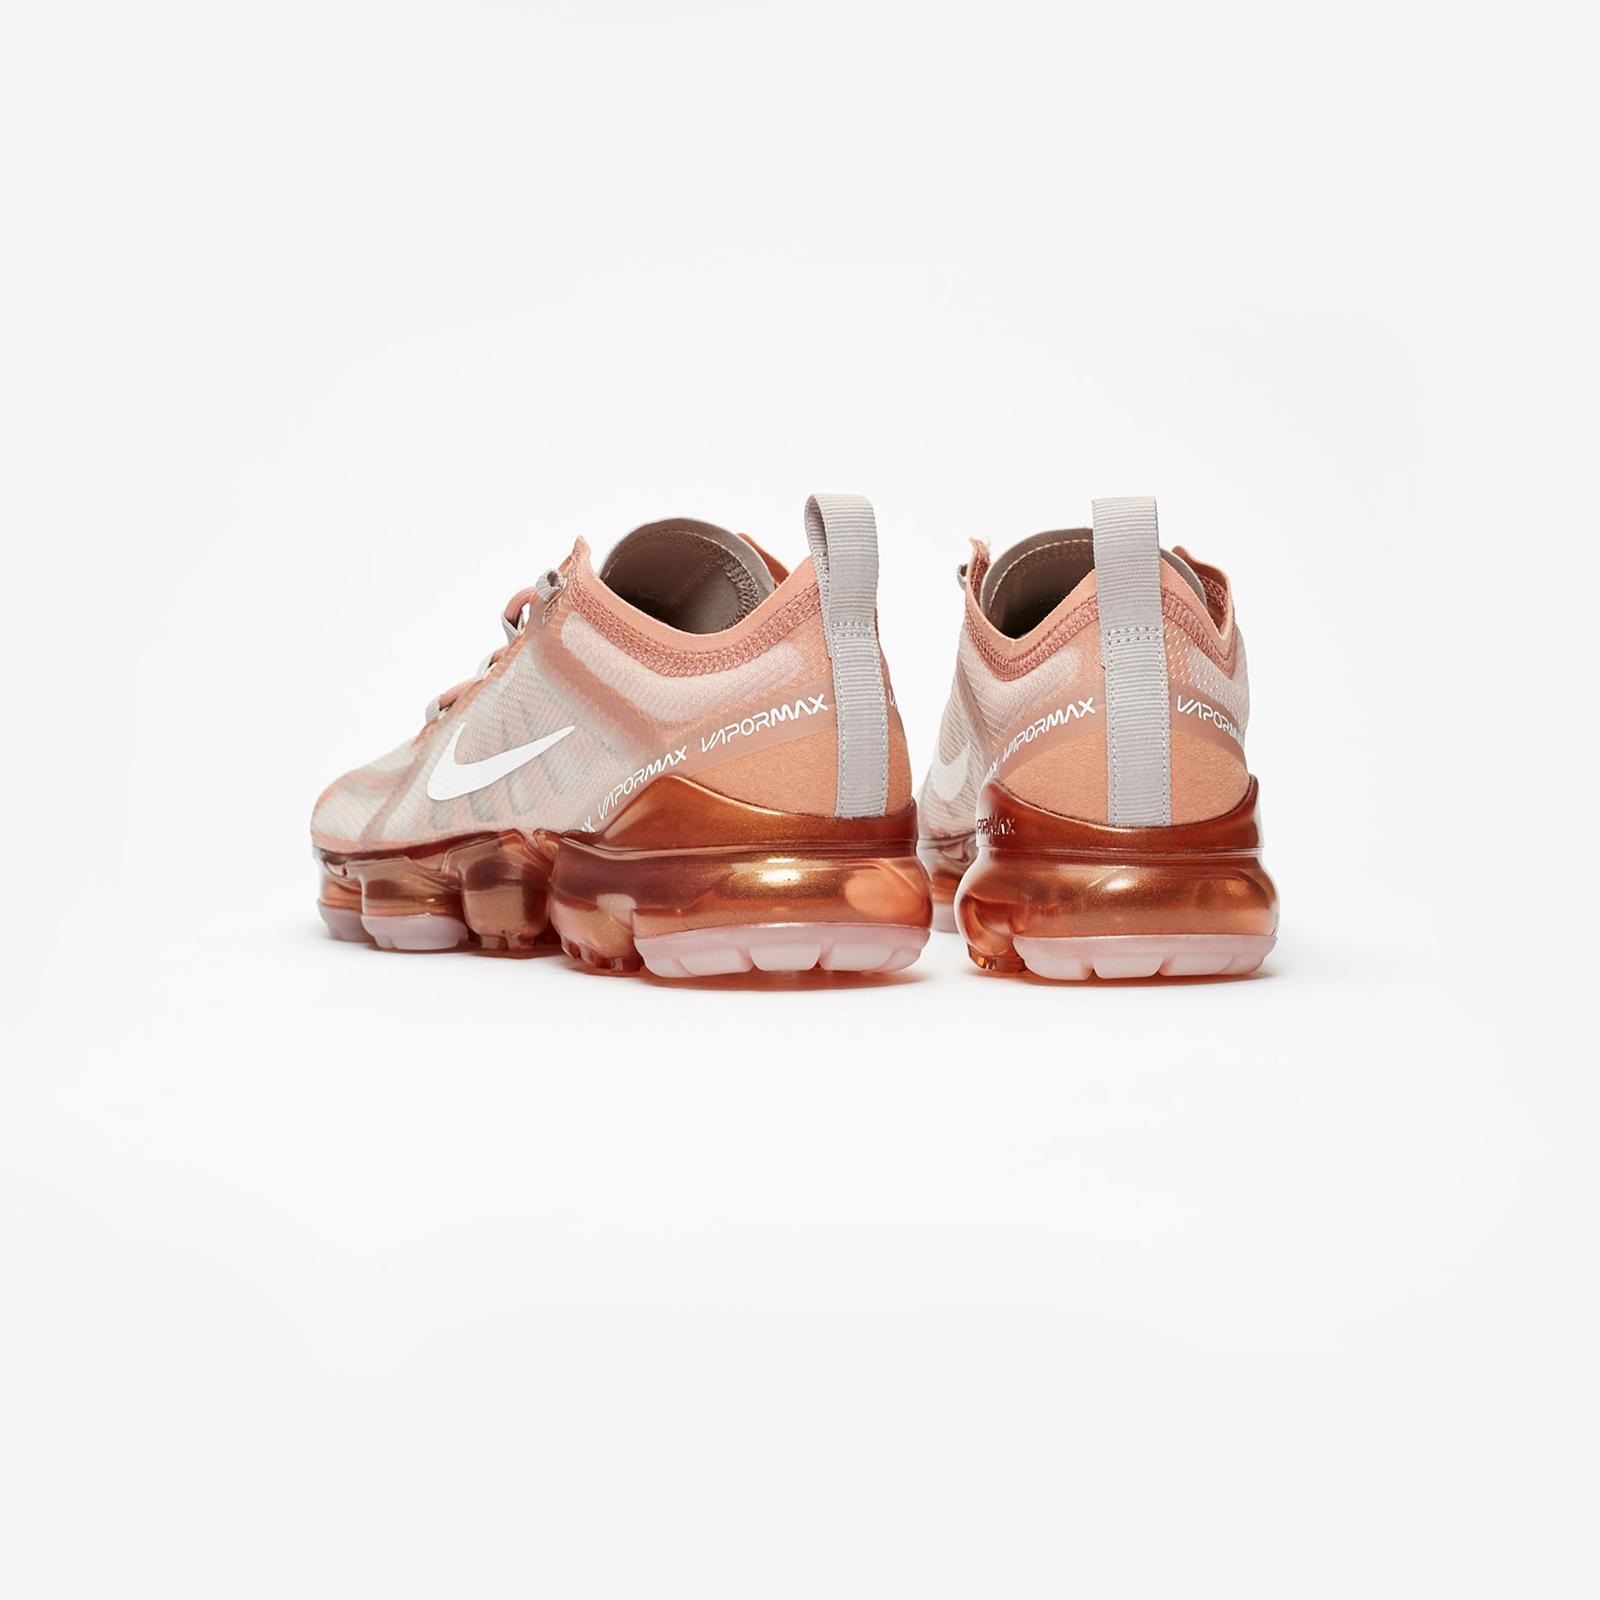 nike air vapormax 2019 rose gold